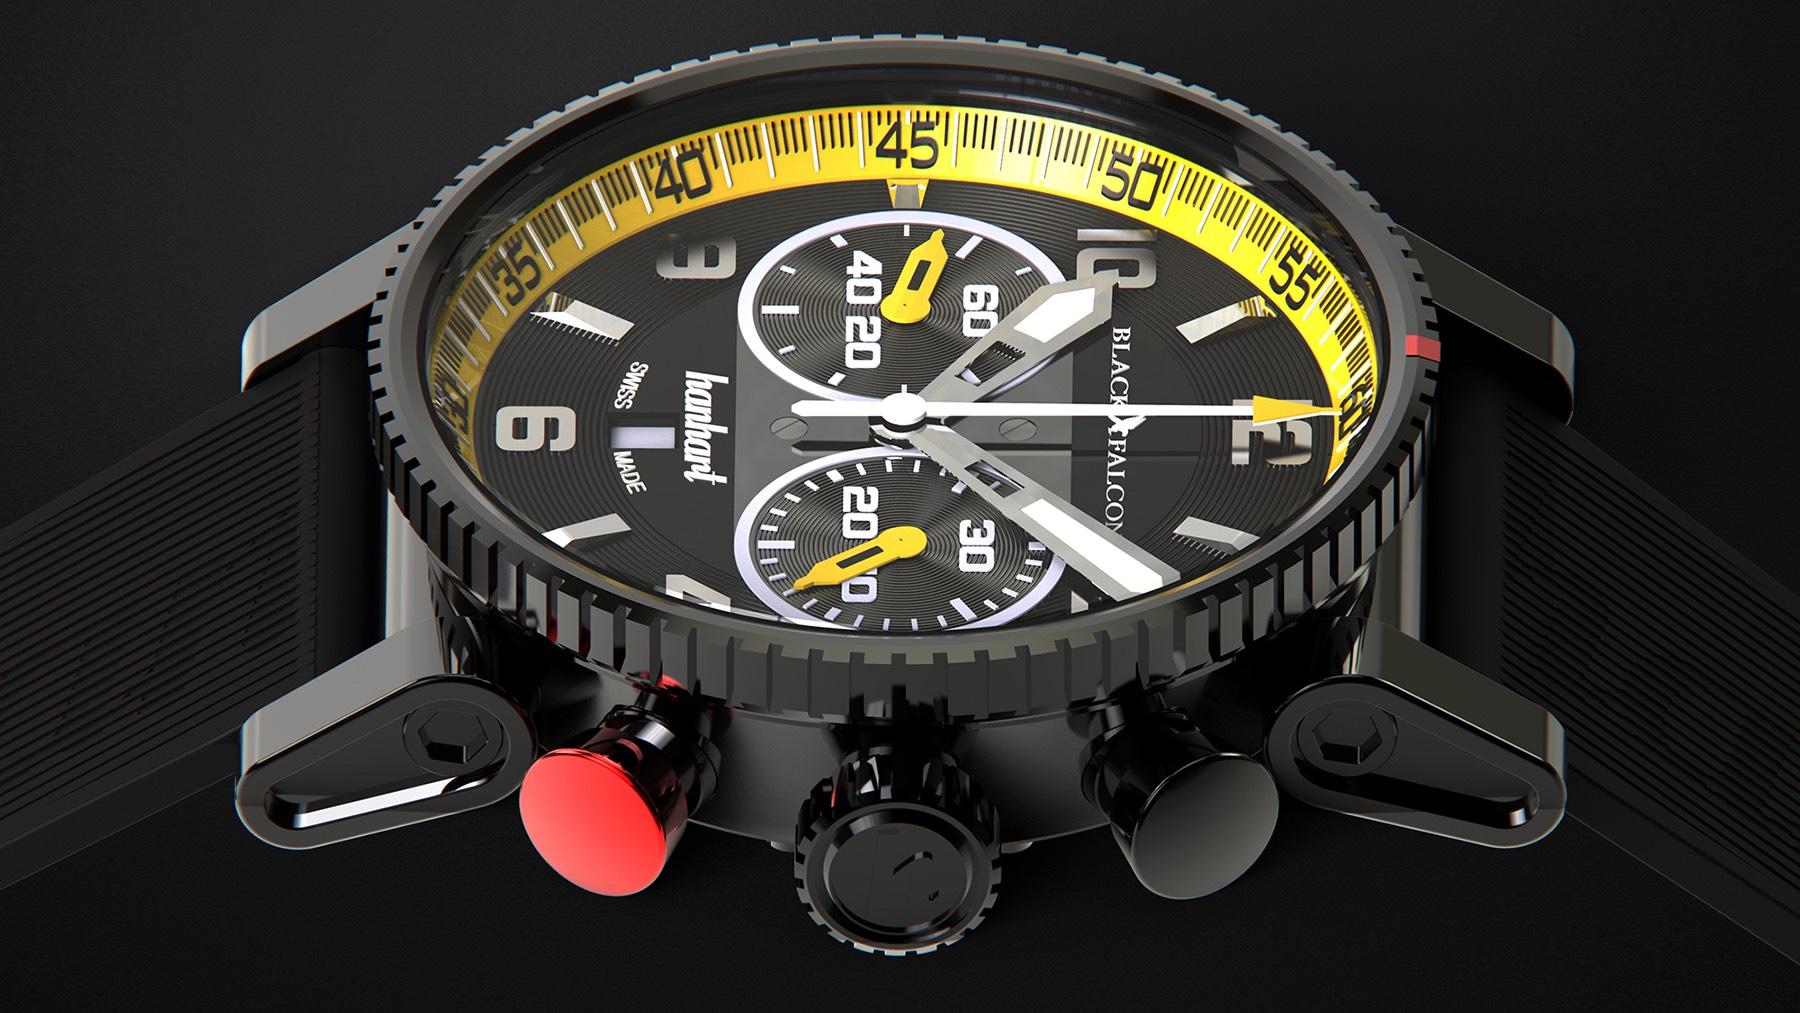 1ef79c98b42 Introducing - Hanhart Primus Black Falcon Limited Edition (Specs ...